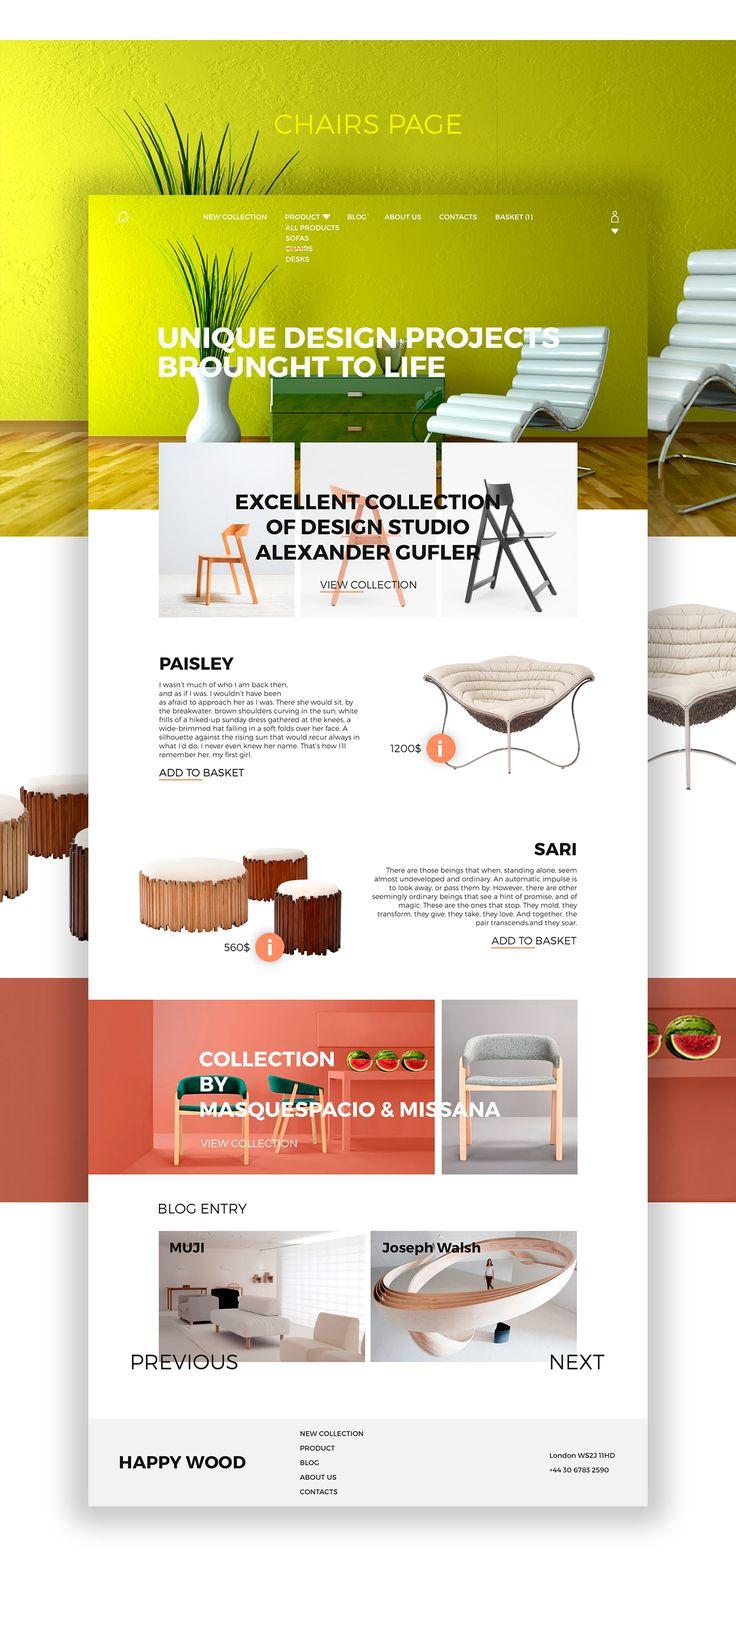 Demeyer Furniture Website. Online Store Interior Goods «HAPPY WOOD» On Web  Design Served